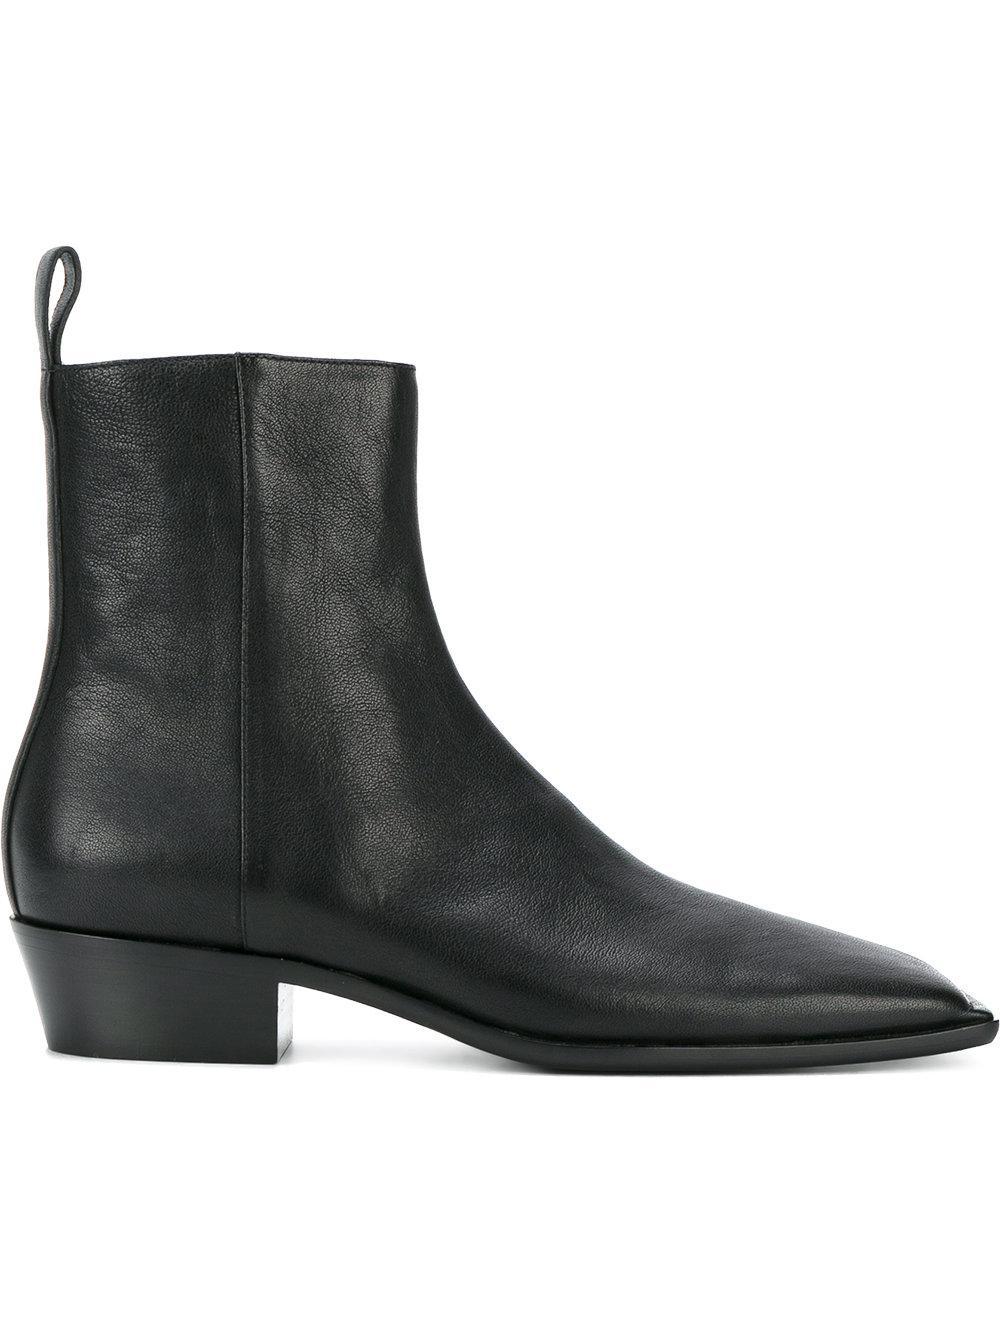 b84d17e724ac Lyst - Balenciaga - Quadro Boots - Men - Leather - 44 in Black for Men